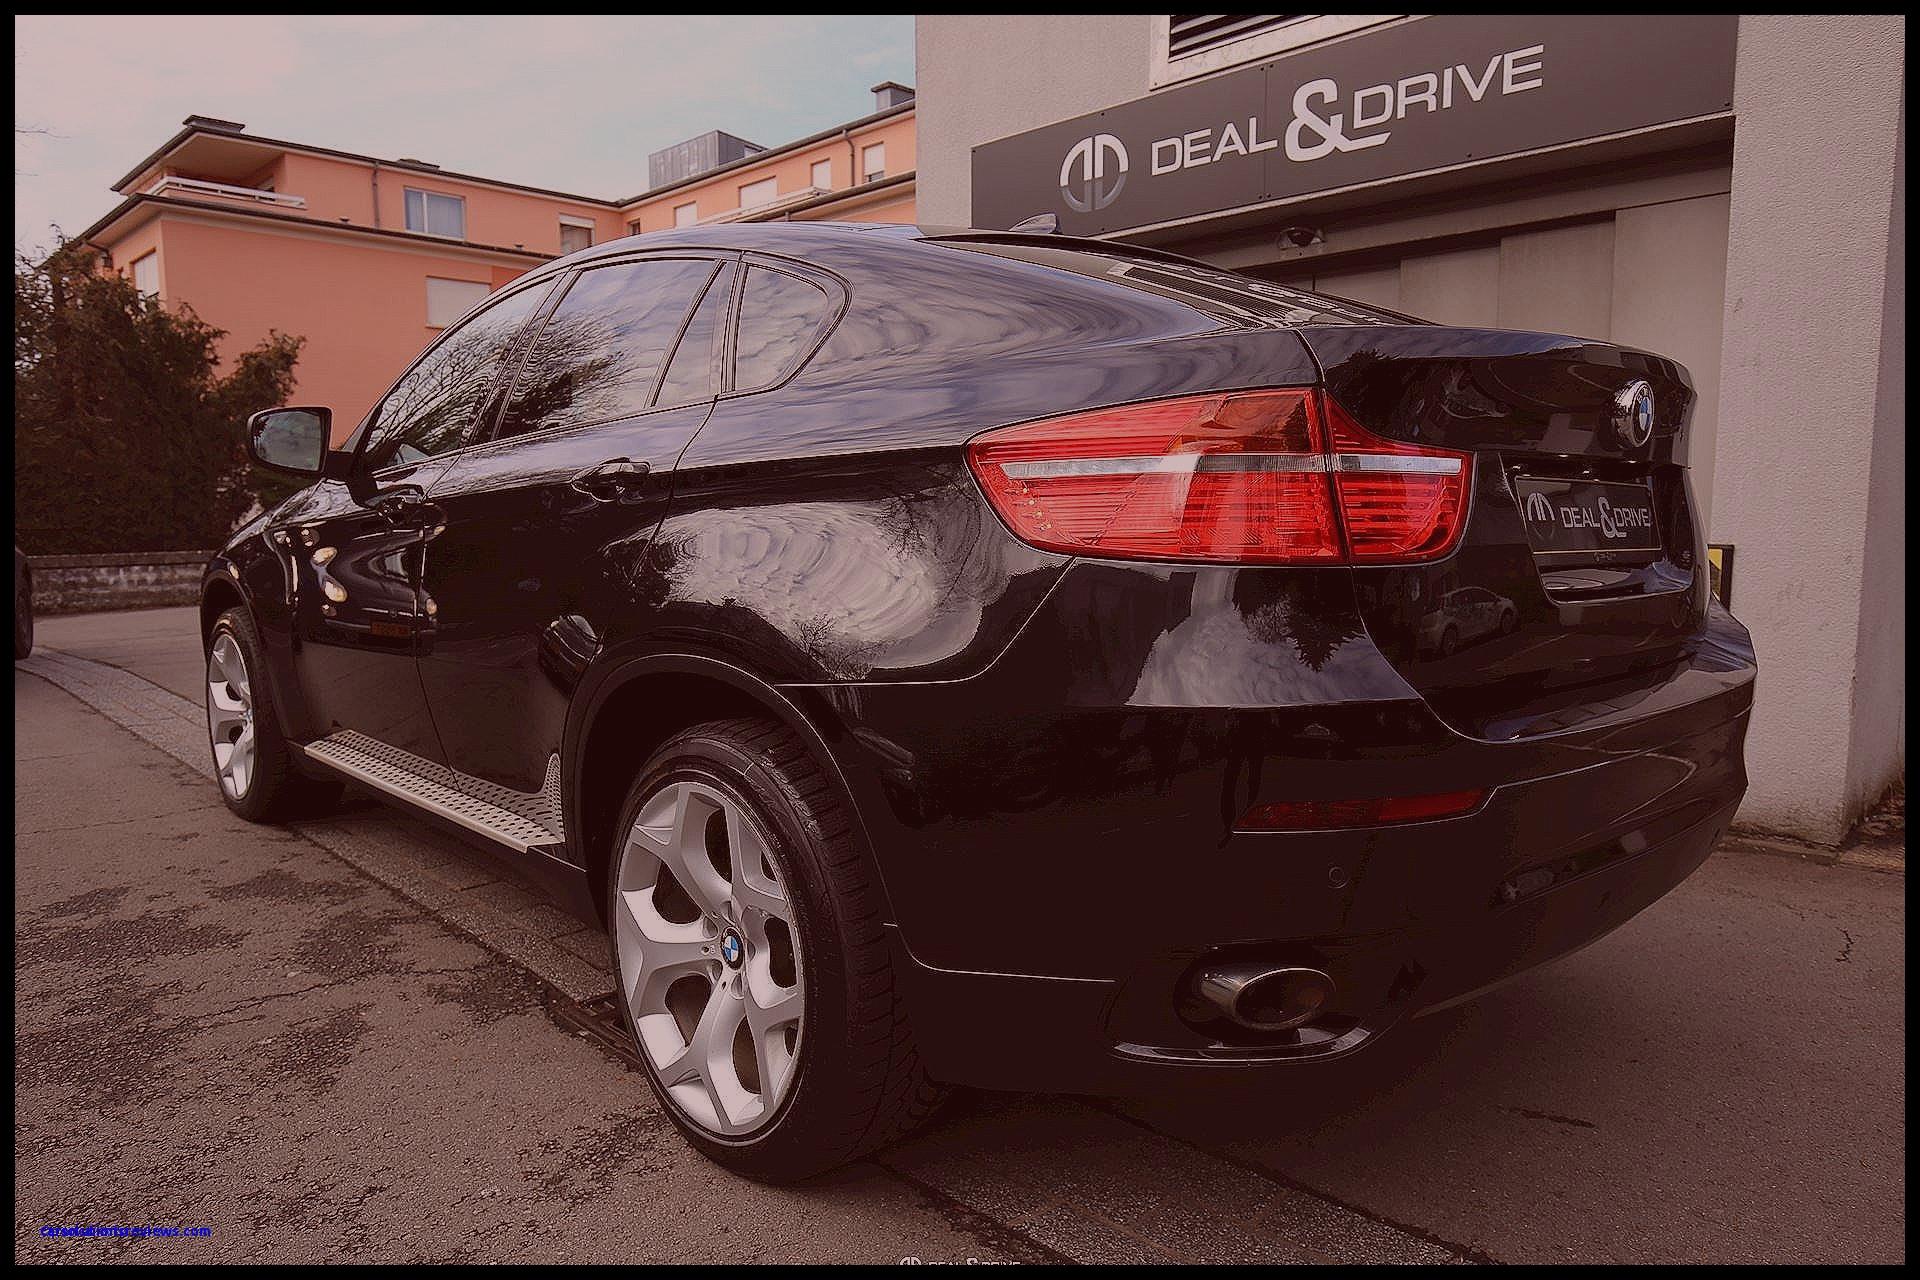 Driver Cars New Cars Deals Best Bmw X6 Xdrive 4 0d Deal & Drive Driver